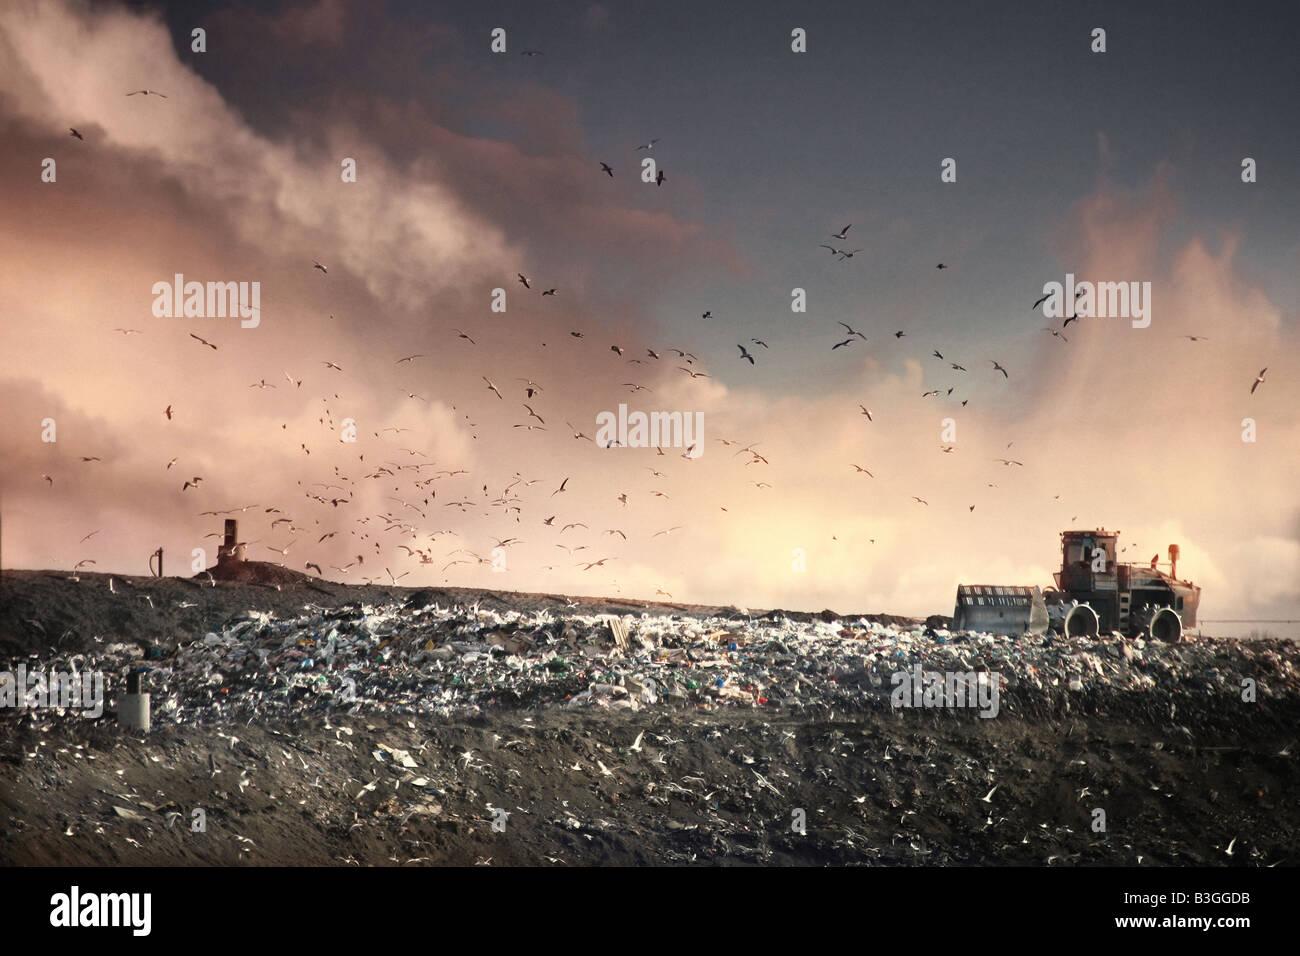 landfill site - Stock Image